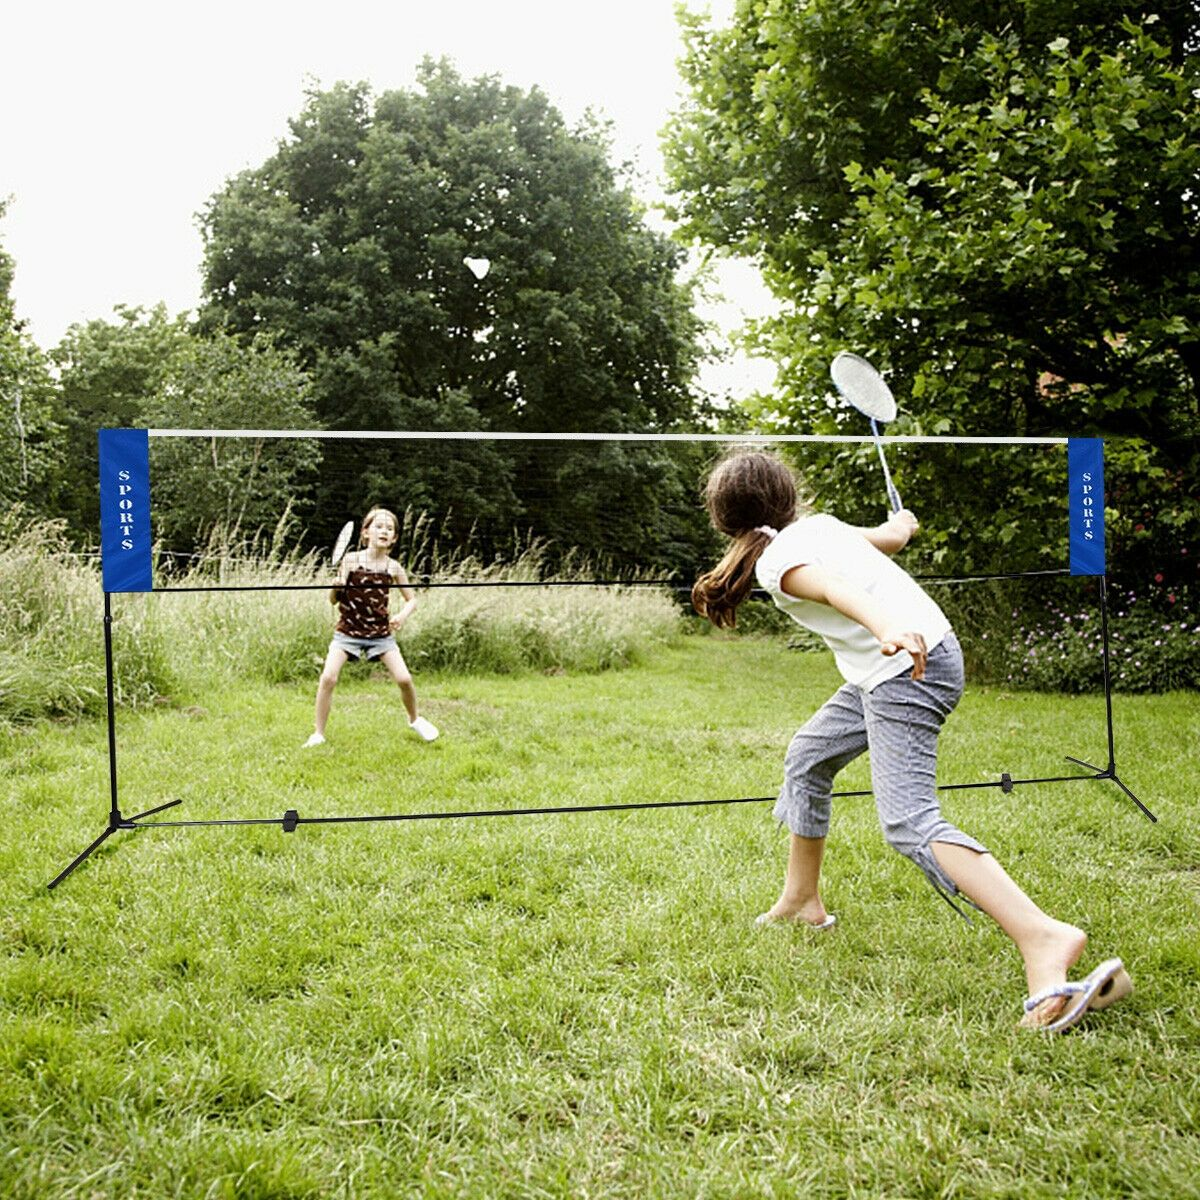 Portable 17 X5 Badminton Training Net With Carrying Bag In 2020 Badminton Badminton Set Volleyball Training